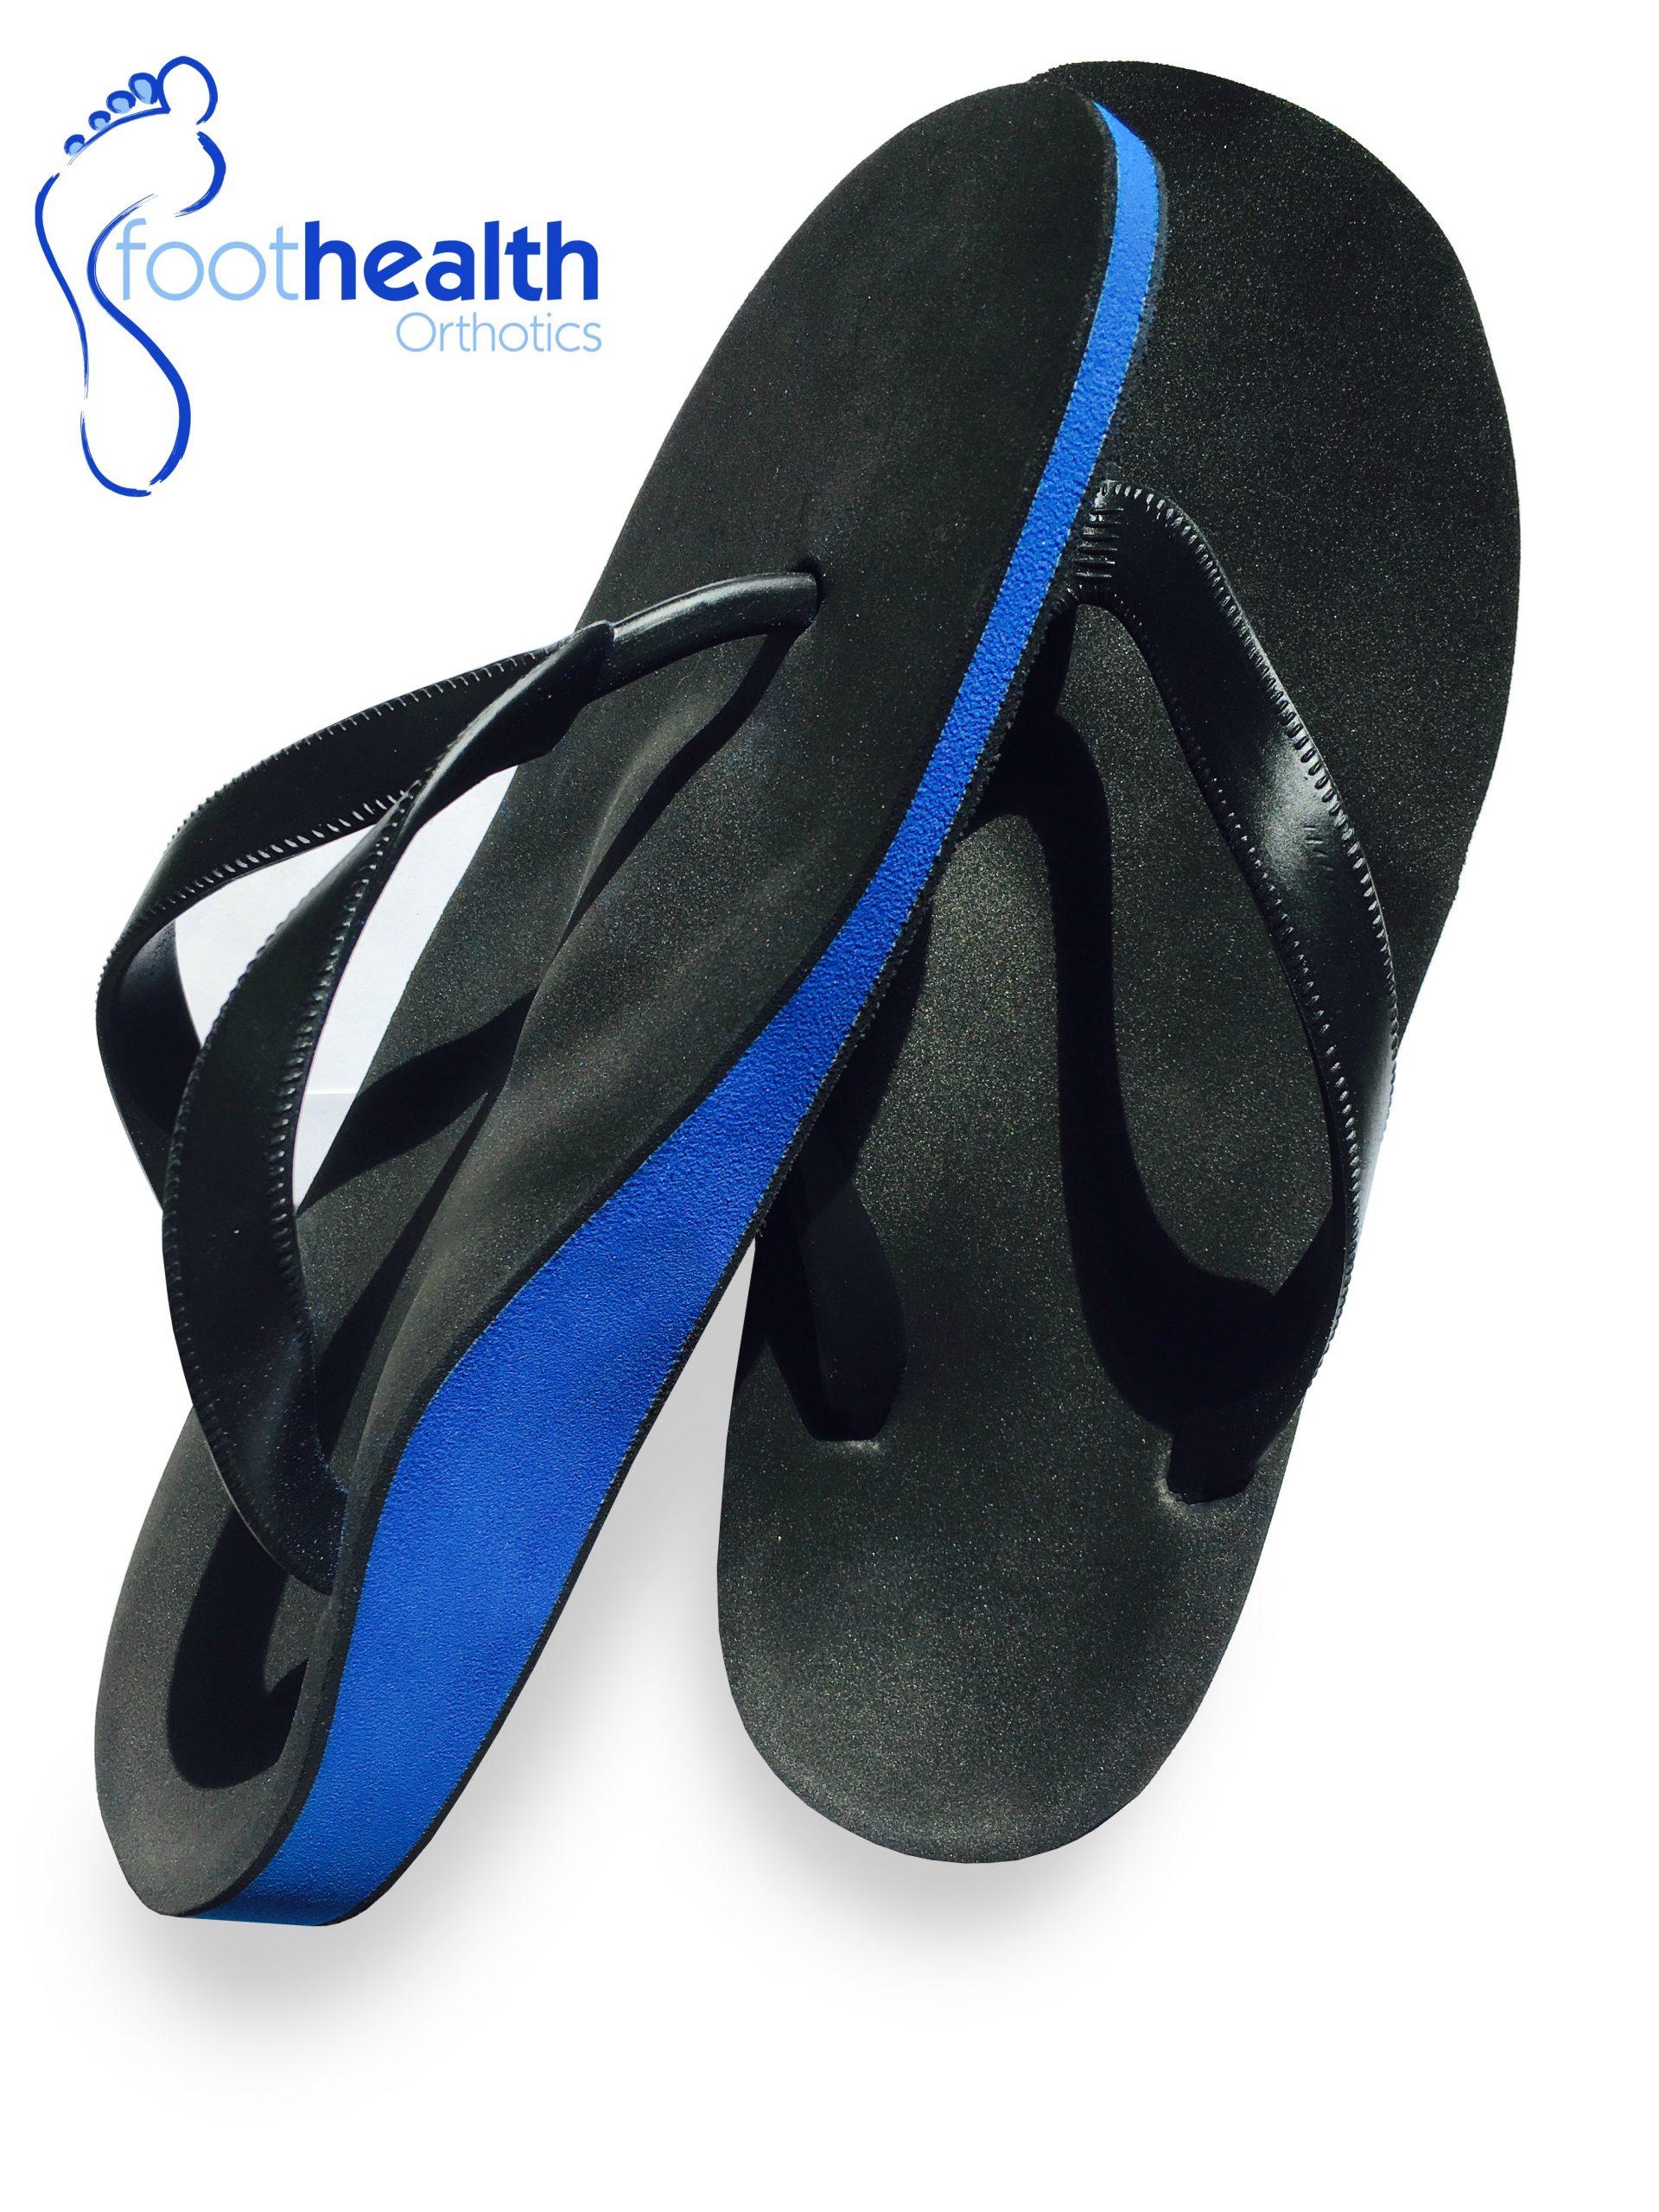 Bespoke Insoles, Flip Flops and Sandals 3